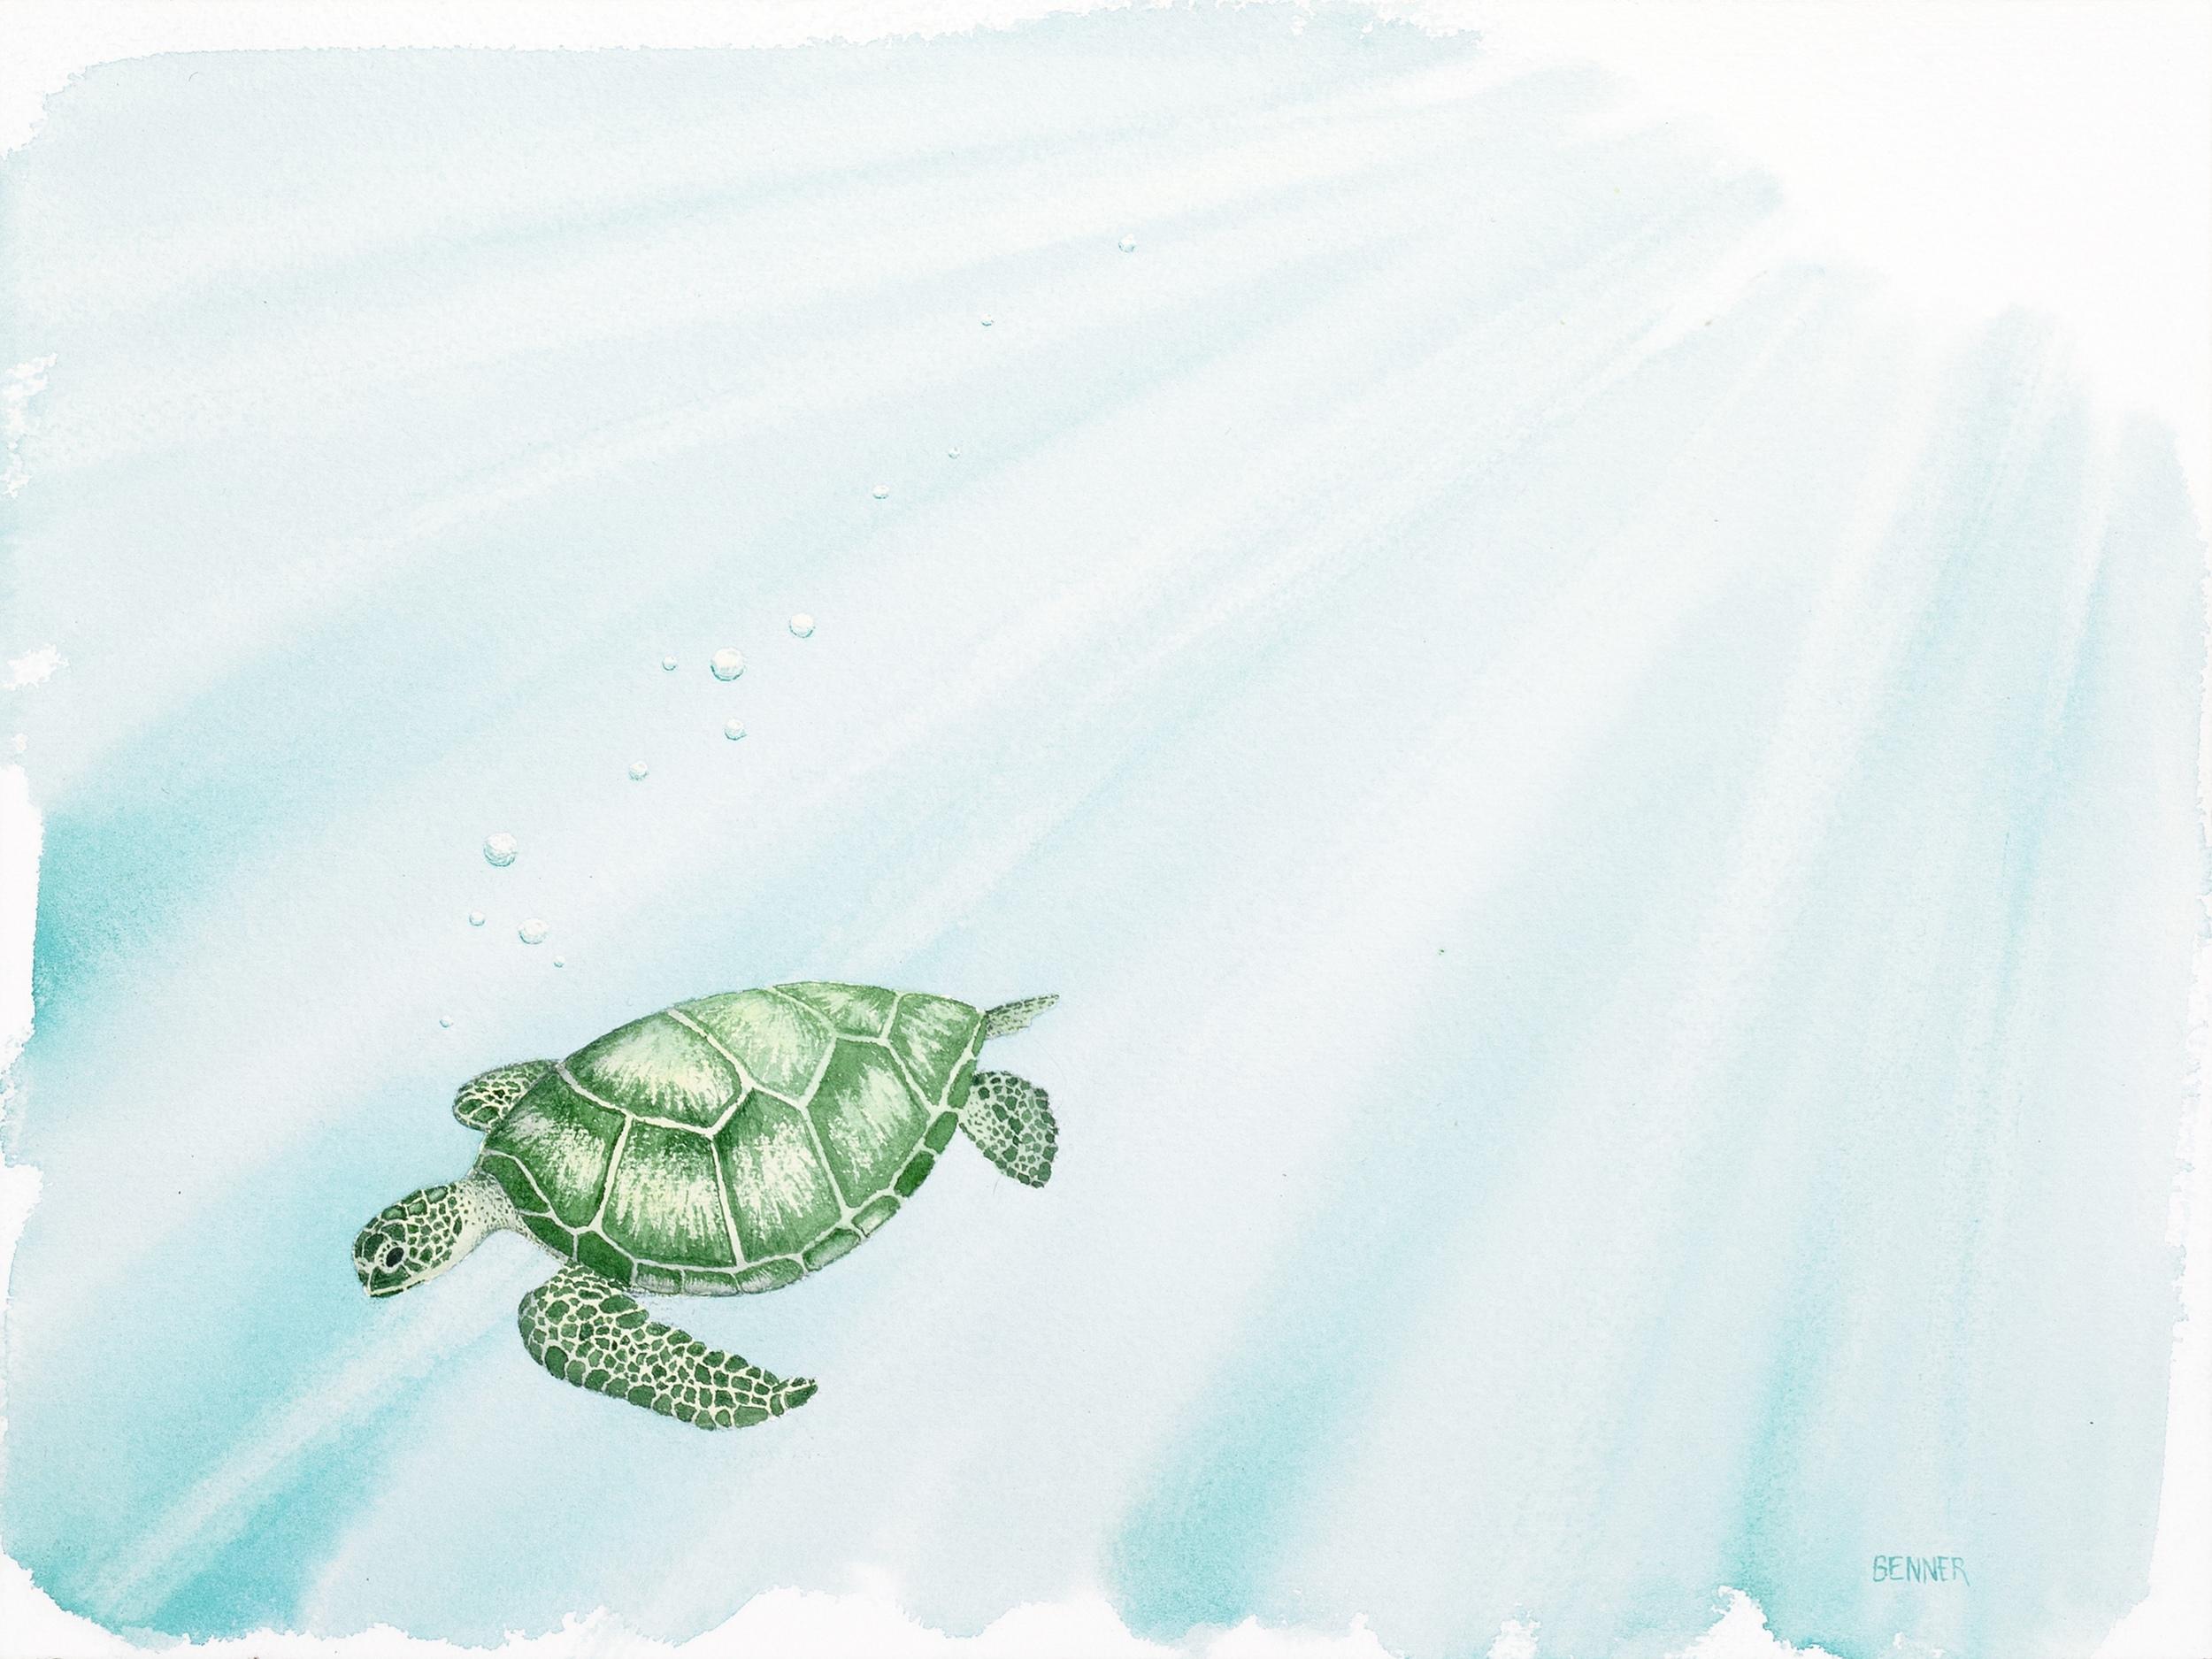 Grn Turtle-1 v2 12x9 300ppi Mac.jpg